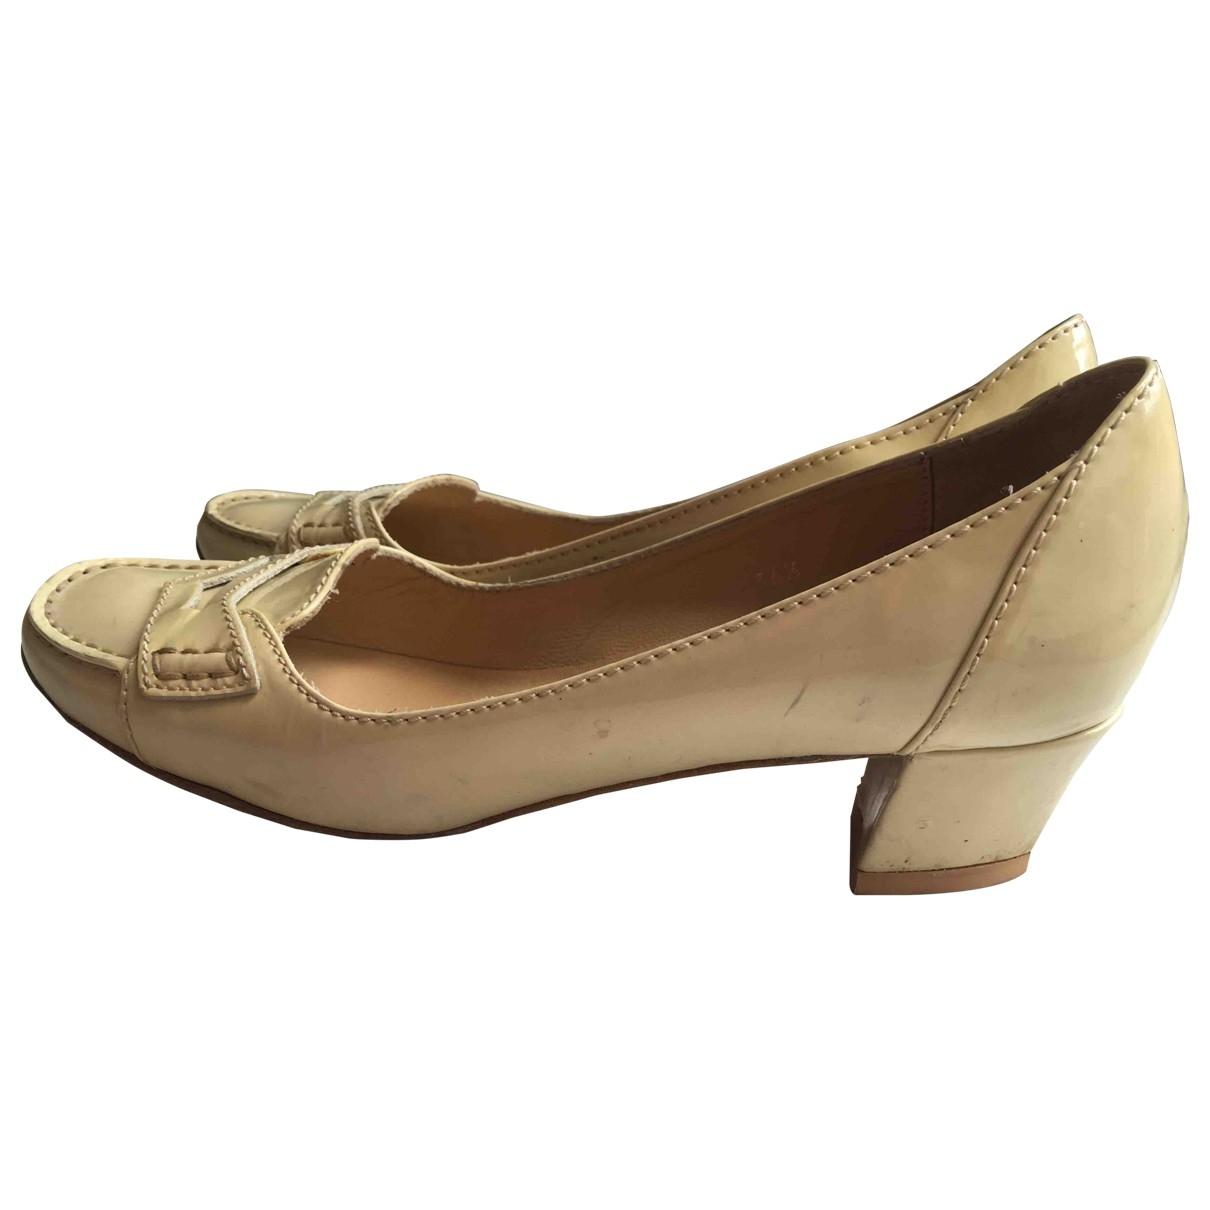 Tod's \N Beige Patent leather Heels for Women 36.5 EU